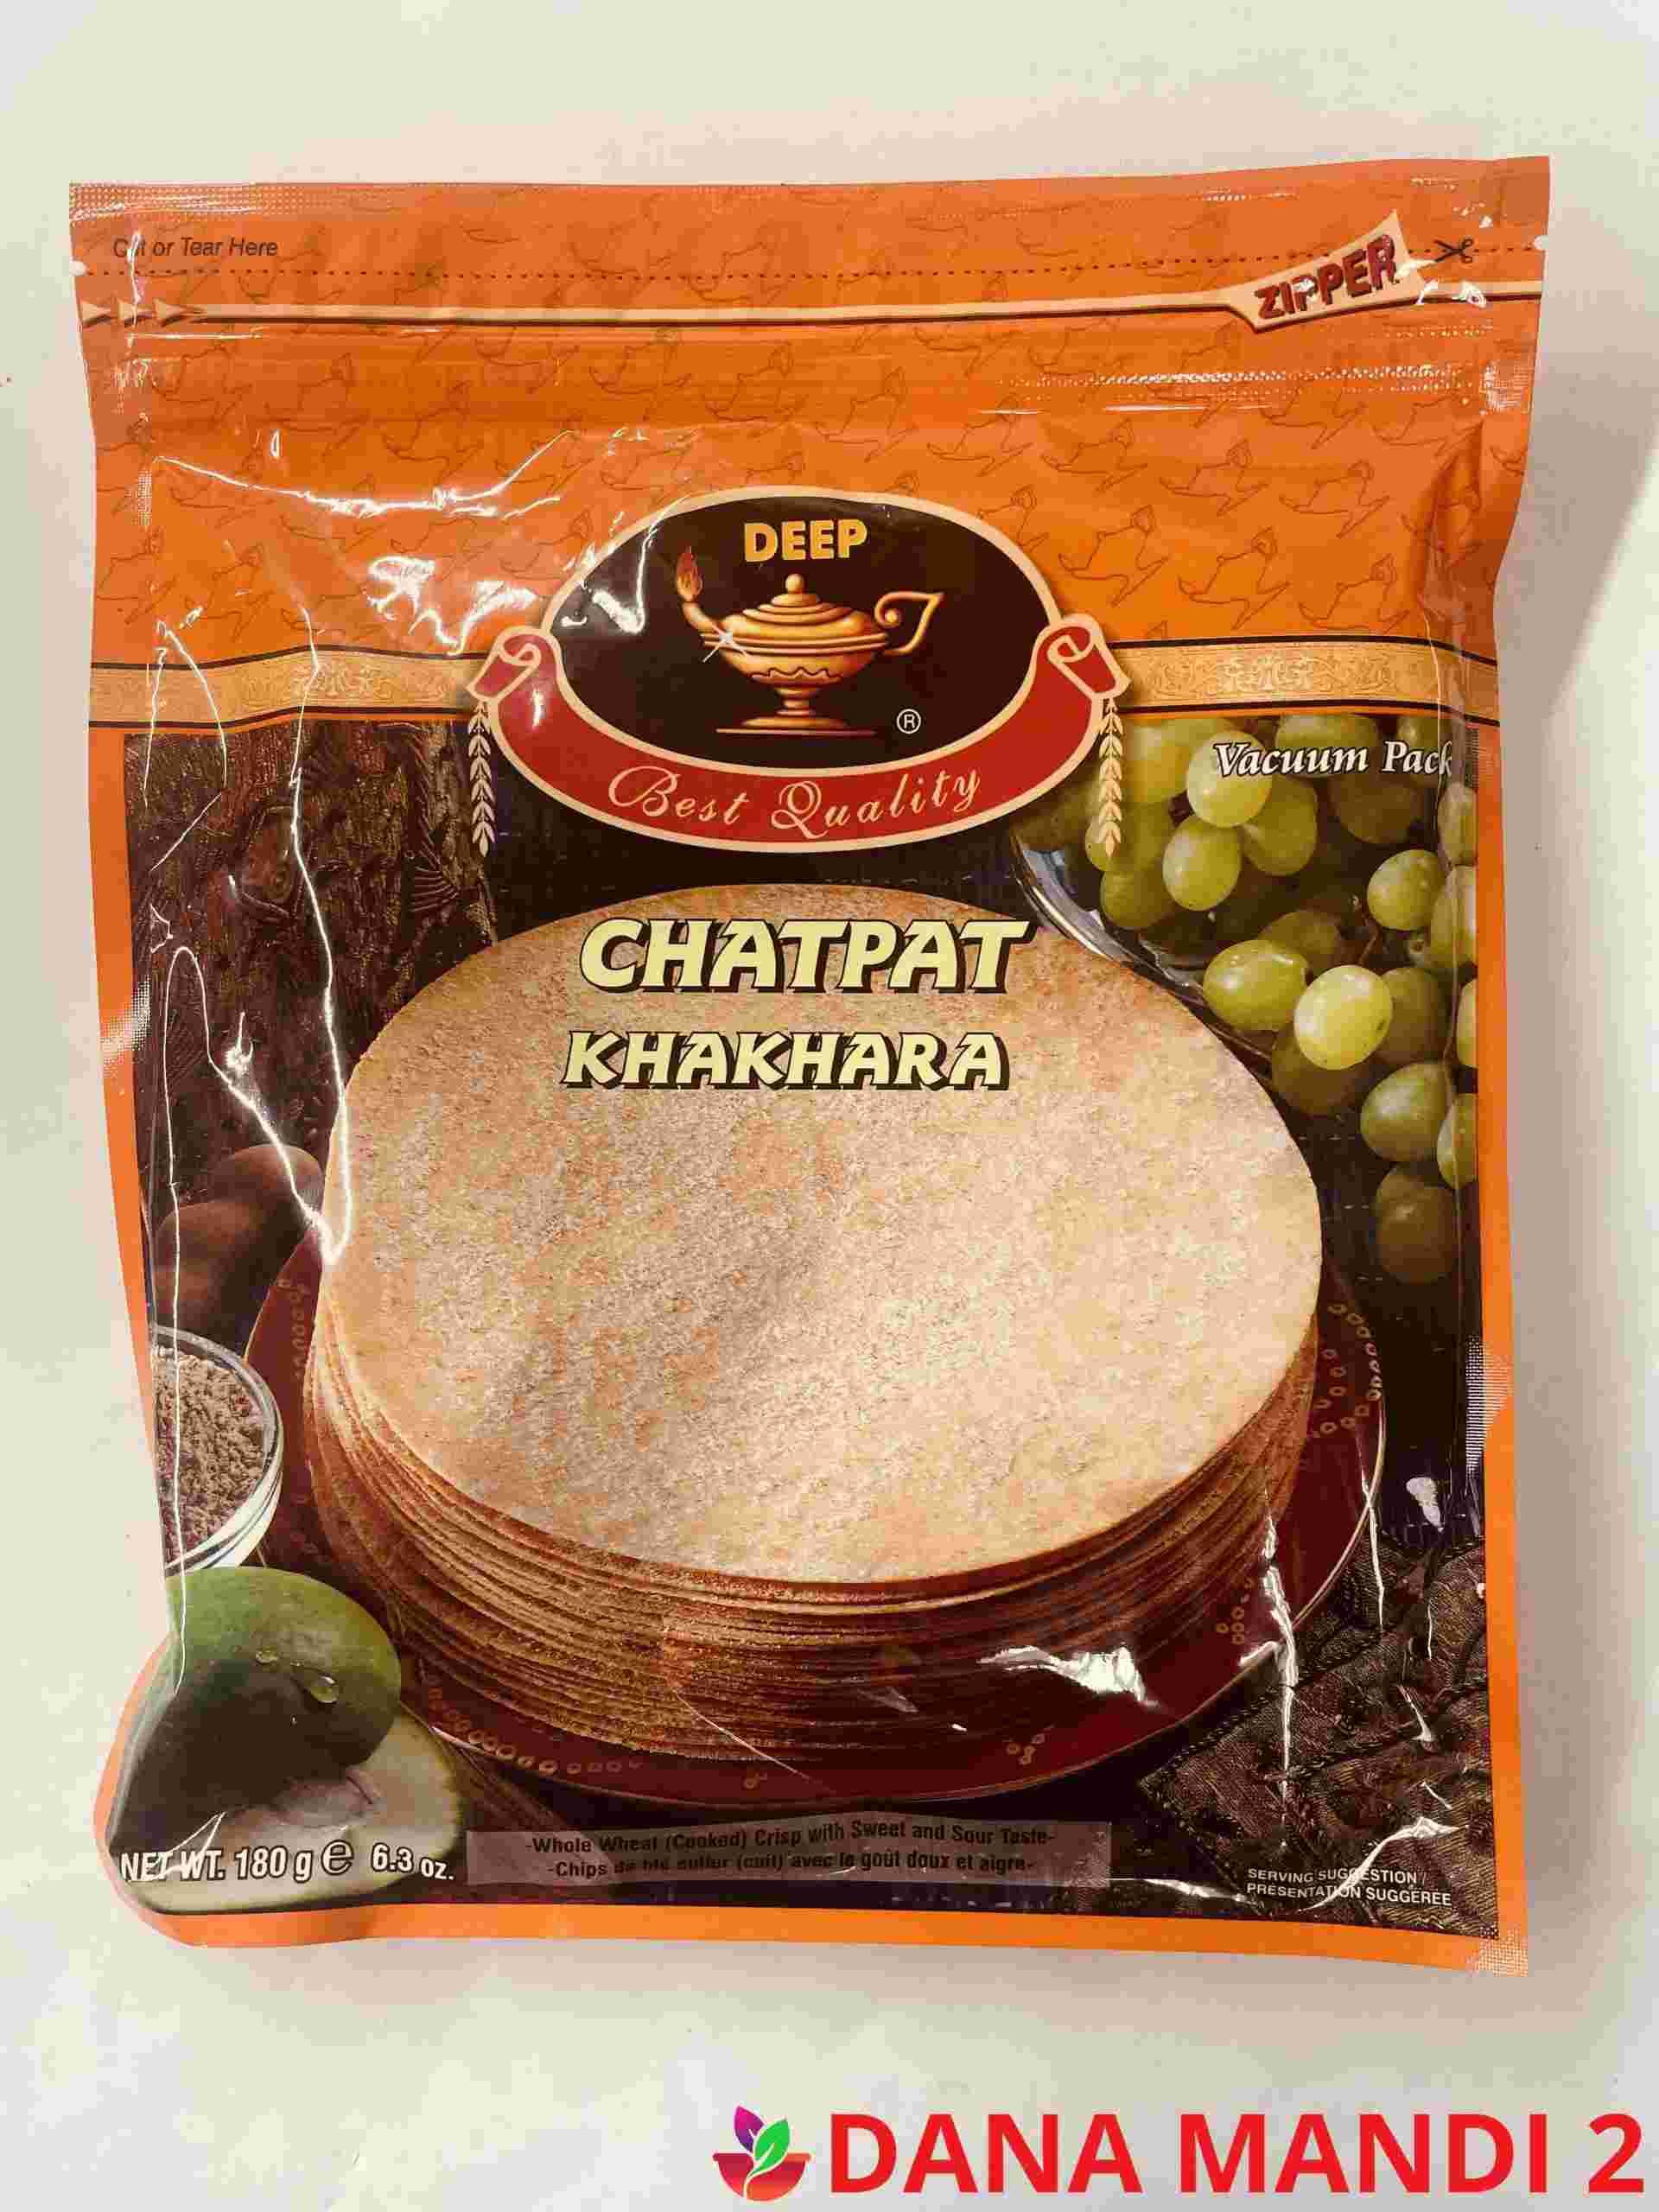 Deep Chatpat Khakhara